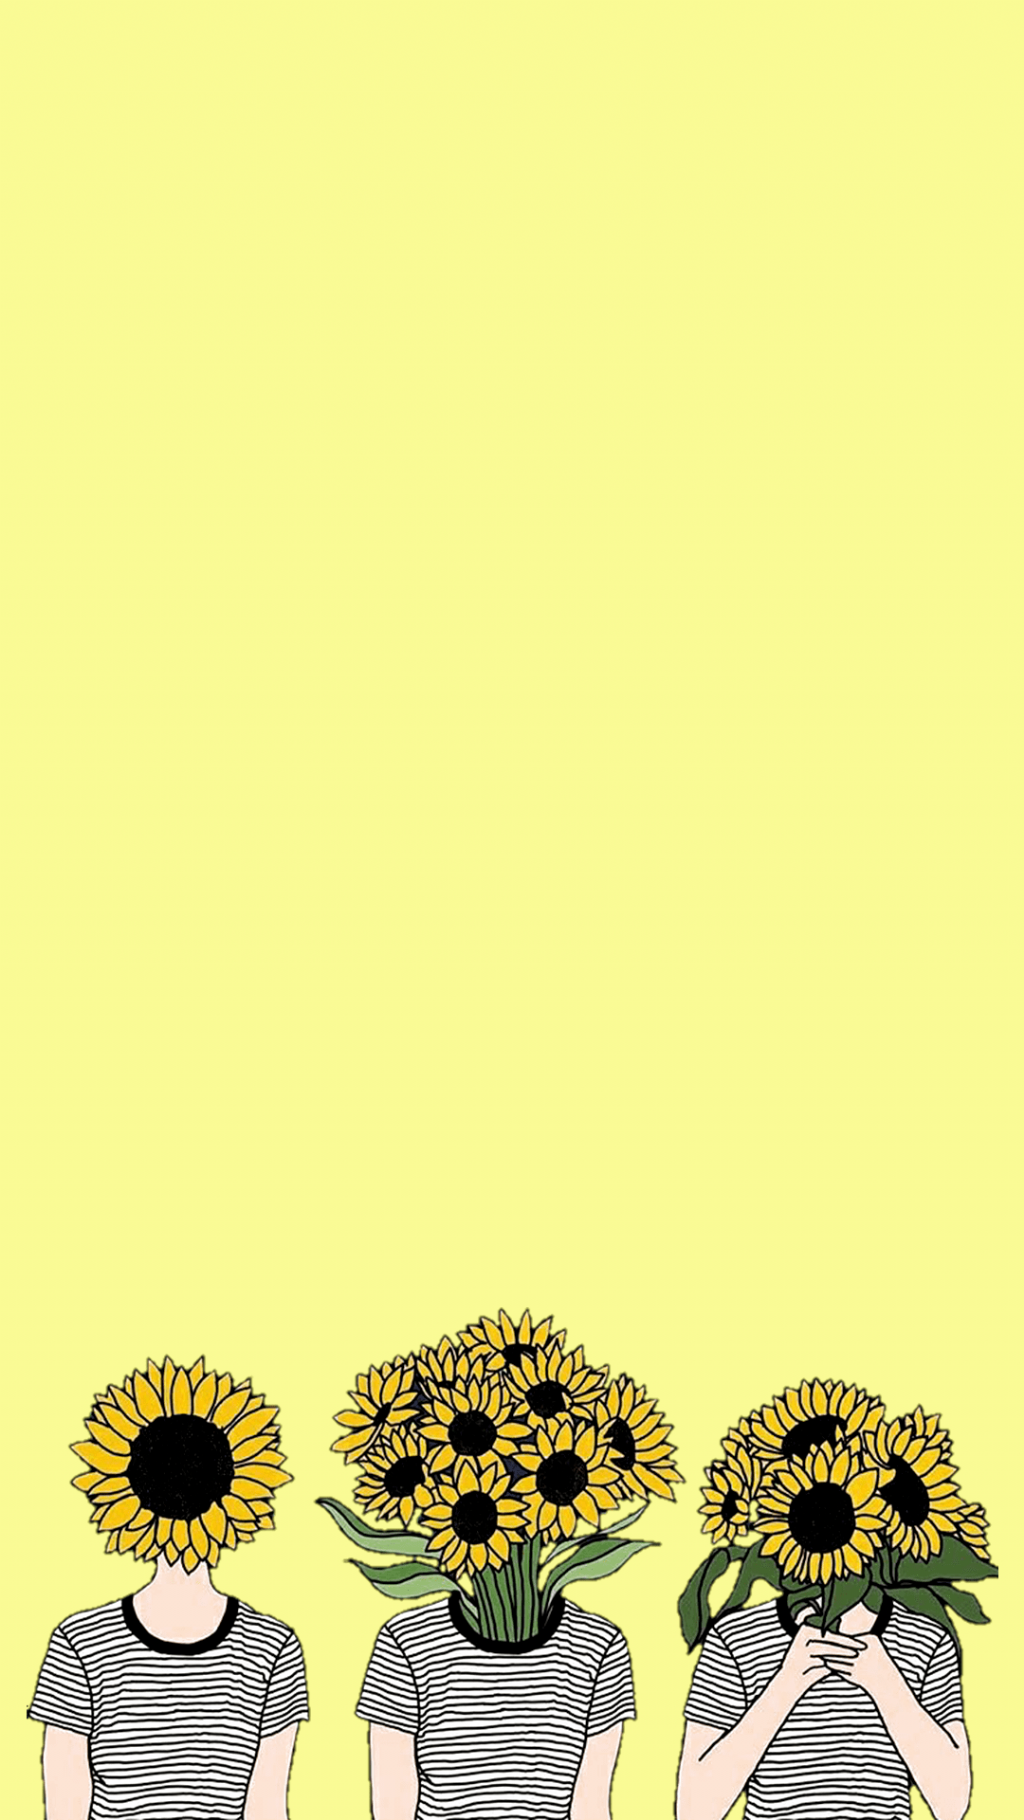 Aesthetic Yellow Vintage Sticker Aesthetic Yellow Vintage In 2020 Yellow Aesthetic Aesthetic Wallpapers Aesthetic Desktop Wallpaper